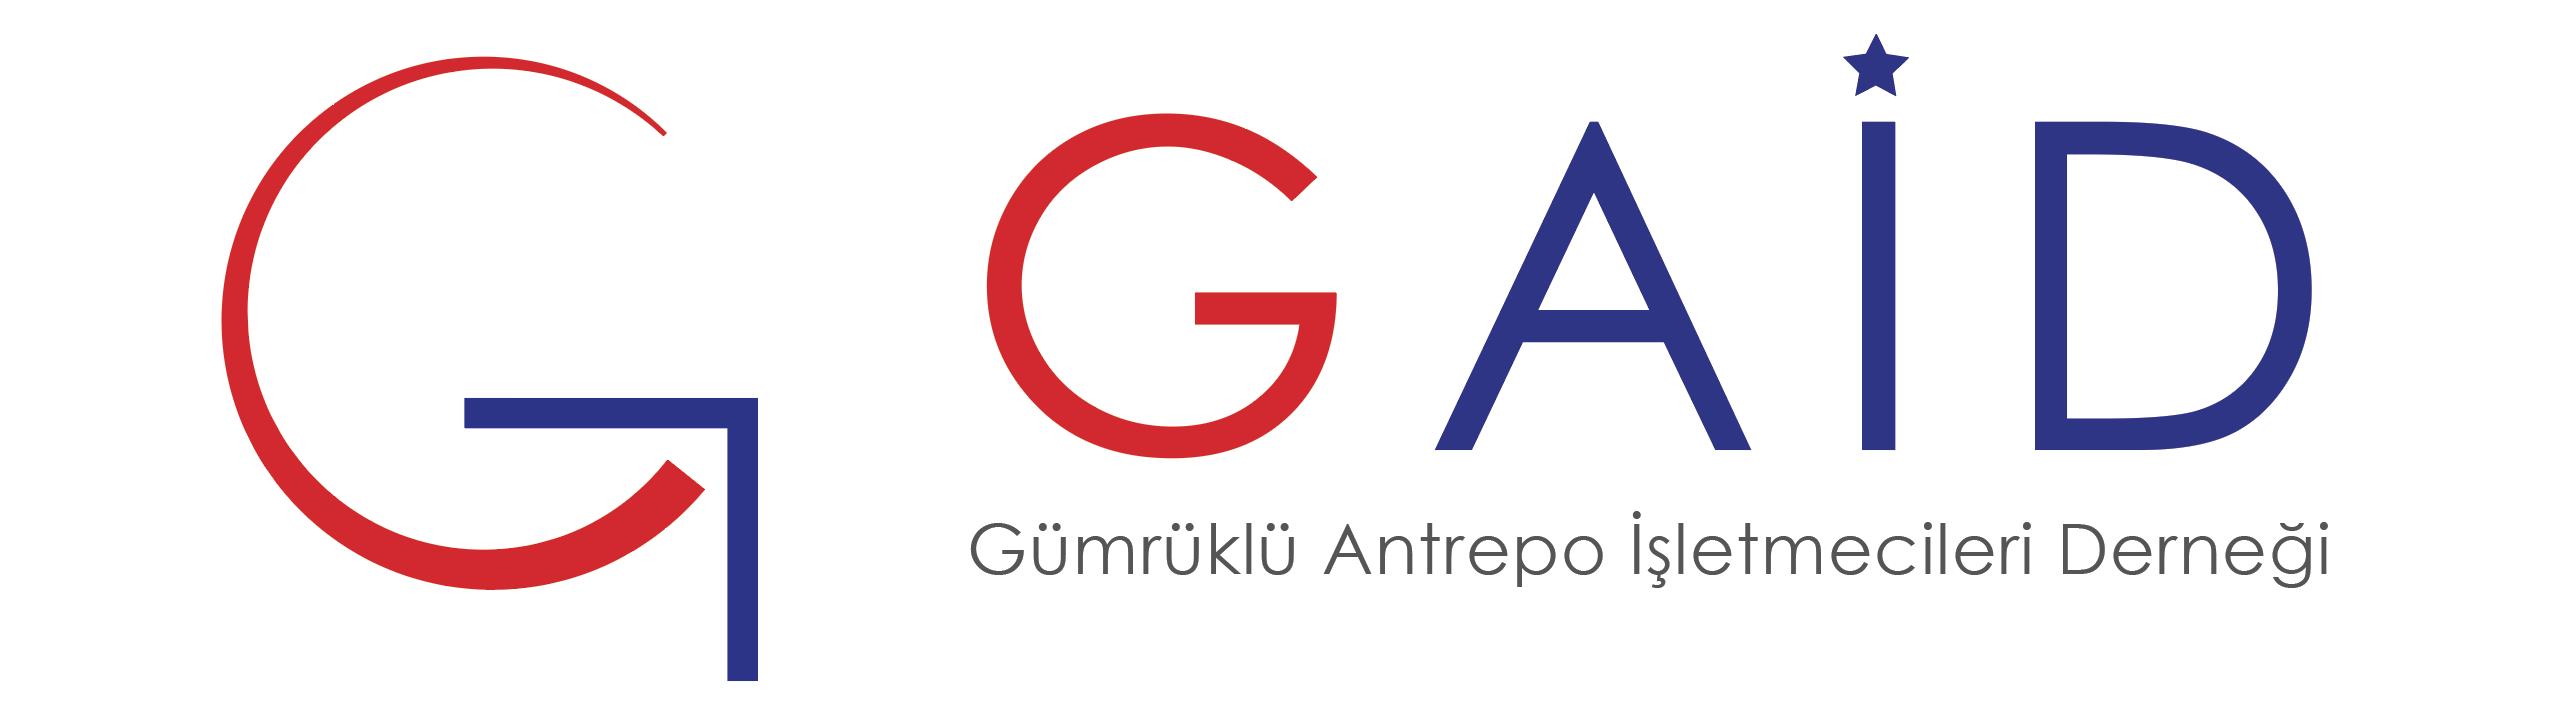 gaid-logo.png